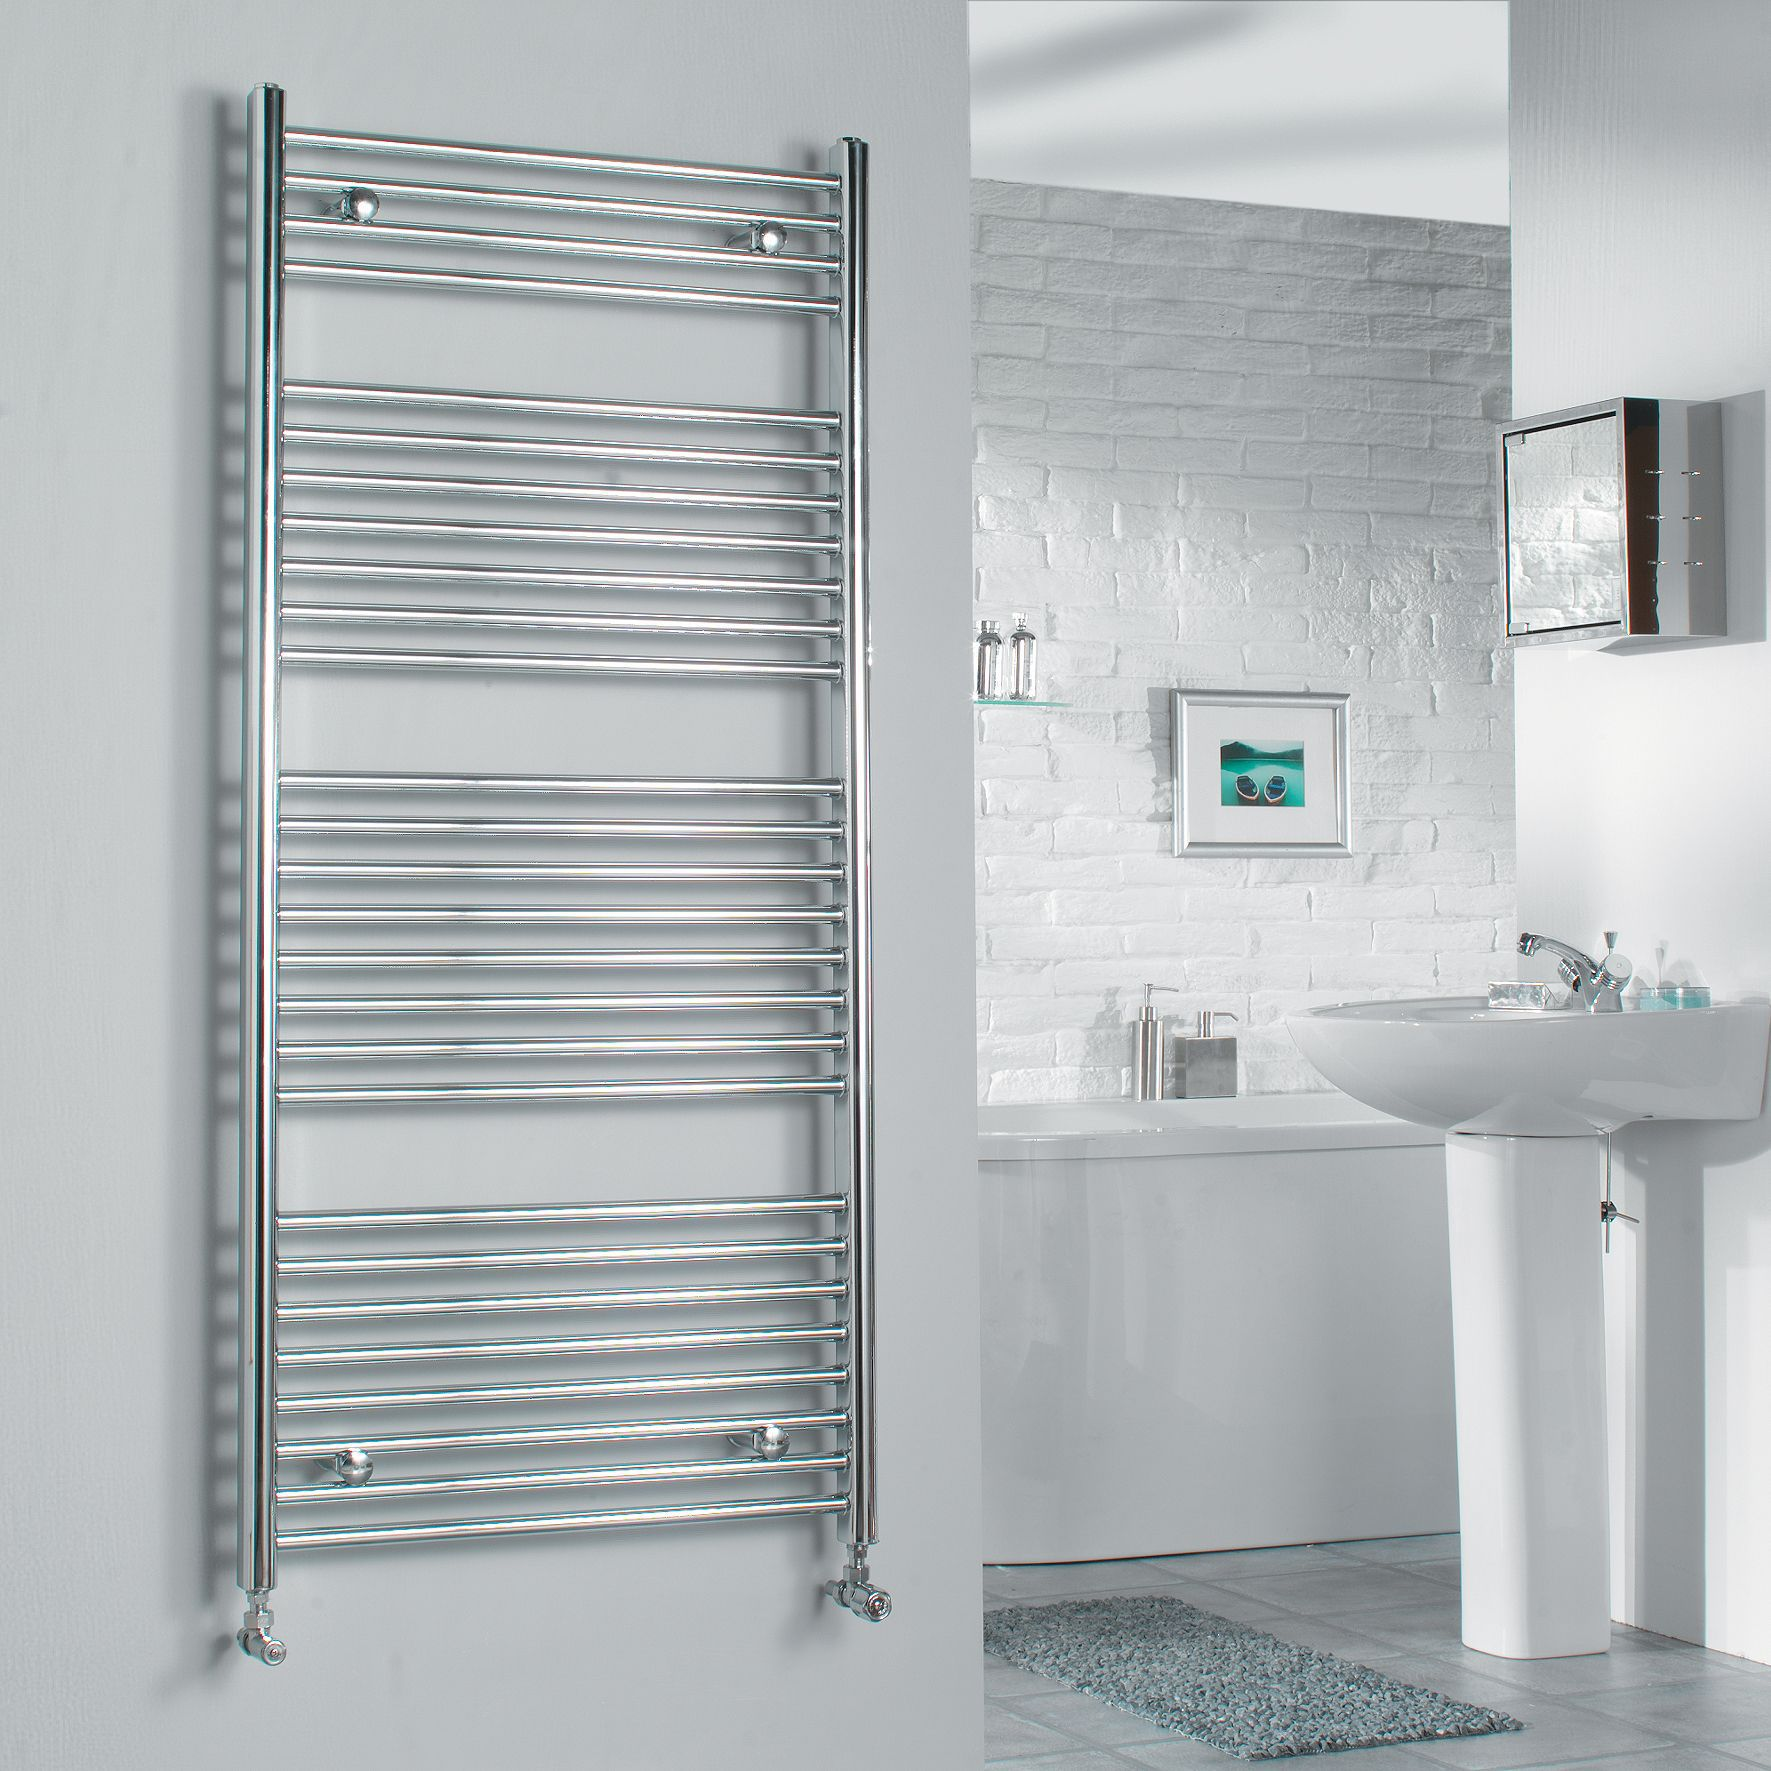 Electric towel rails for bathrooms b q bathroom design ideas for Electric heated towel rails for bathrooms